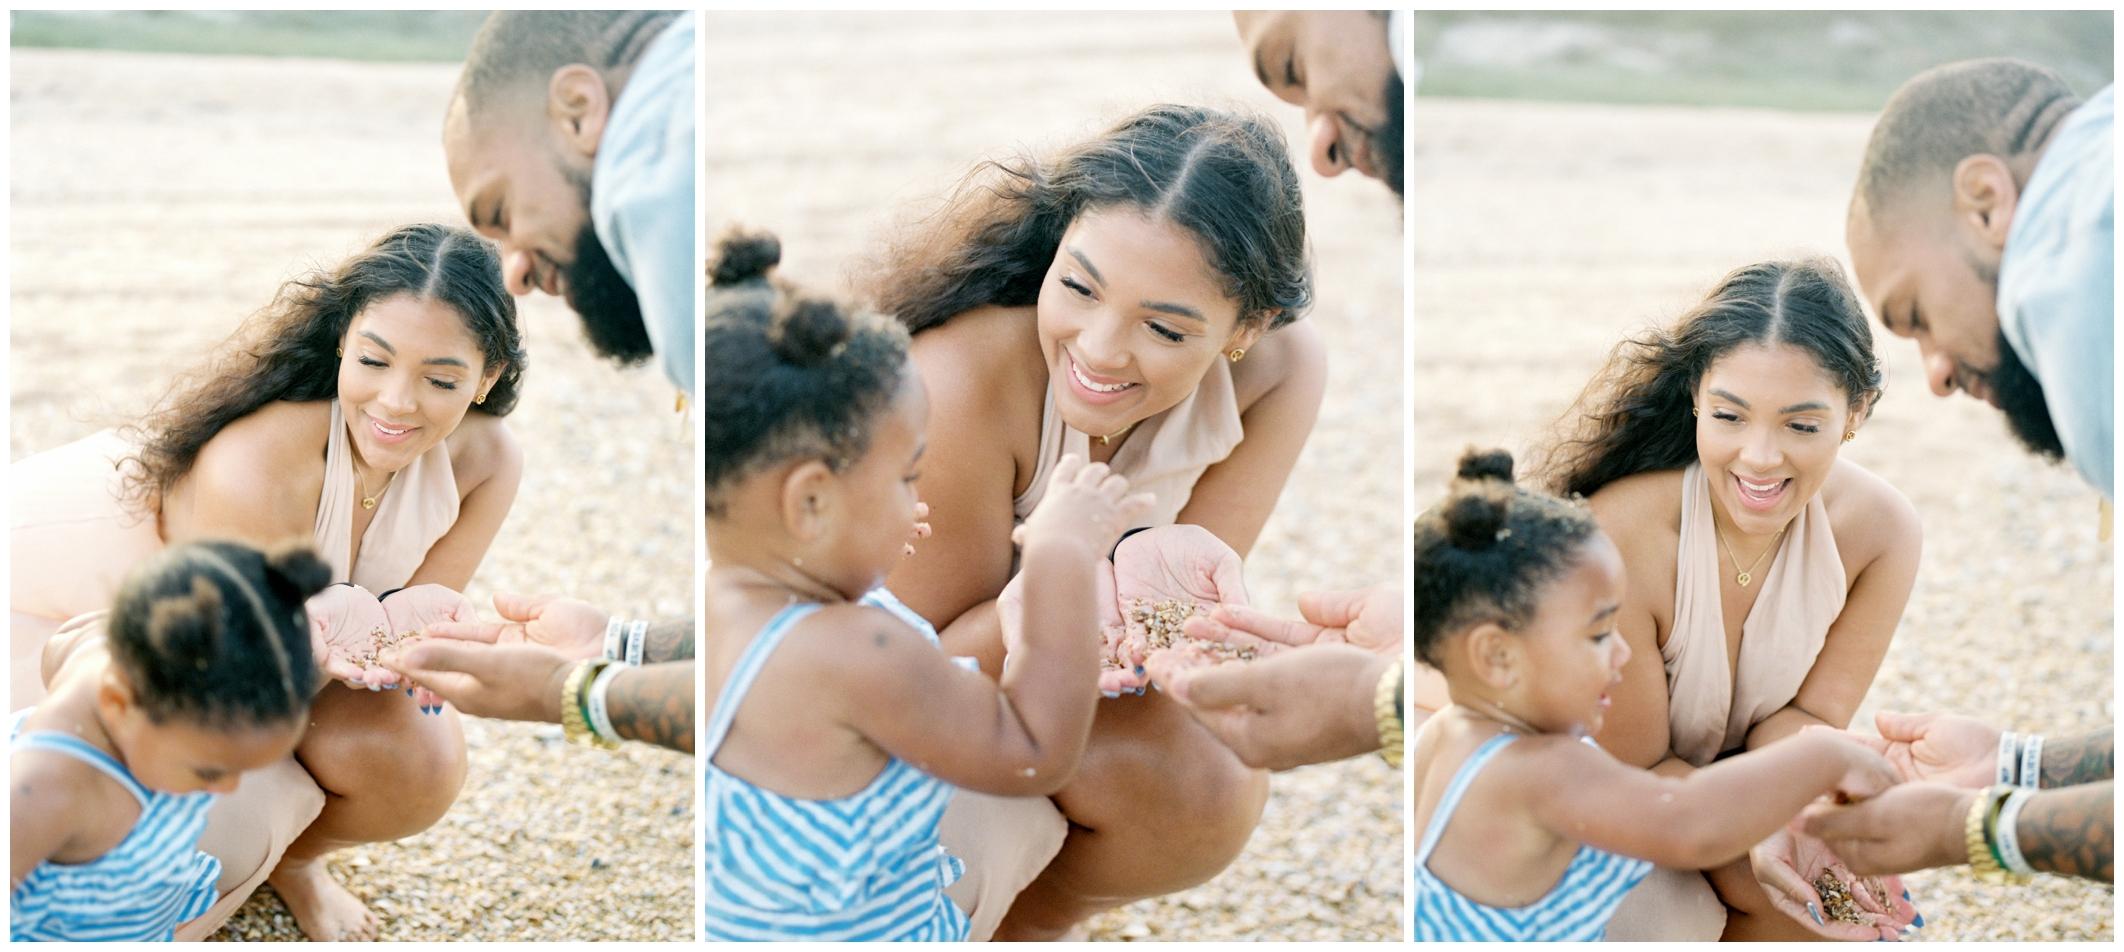 Lisa Silva Photography- Ponte Vedra Beach, St. Augustine and Jacksonville, Florida Fine Art Film Destination Wedding Photography- Family Lifestyle Session at Guana Preserve_0053.jpg